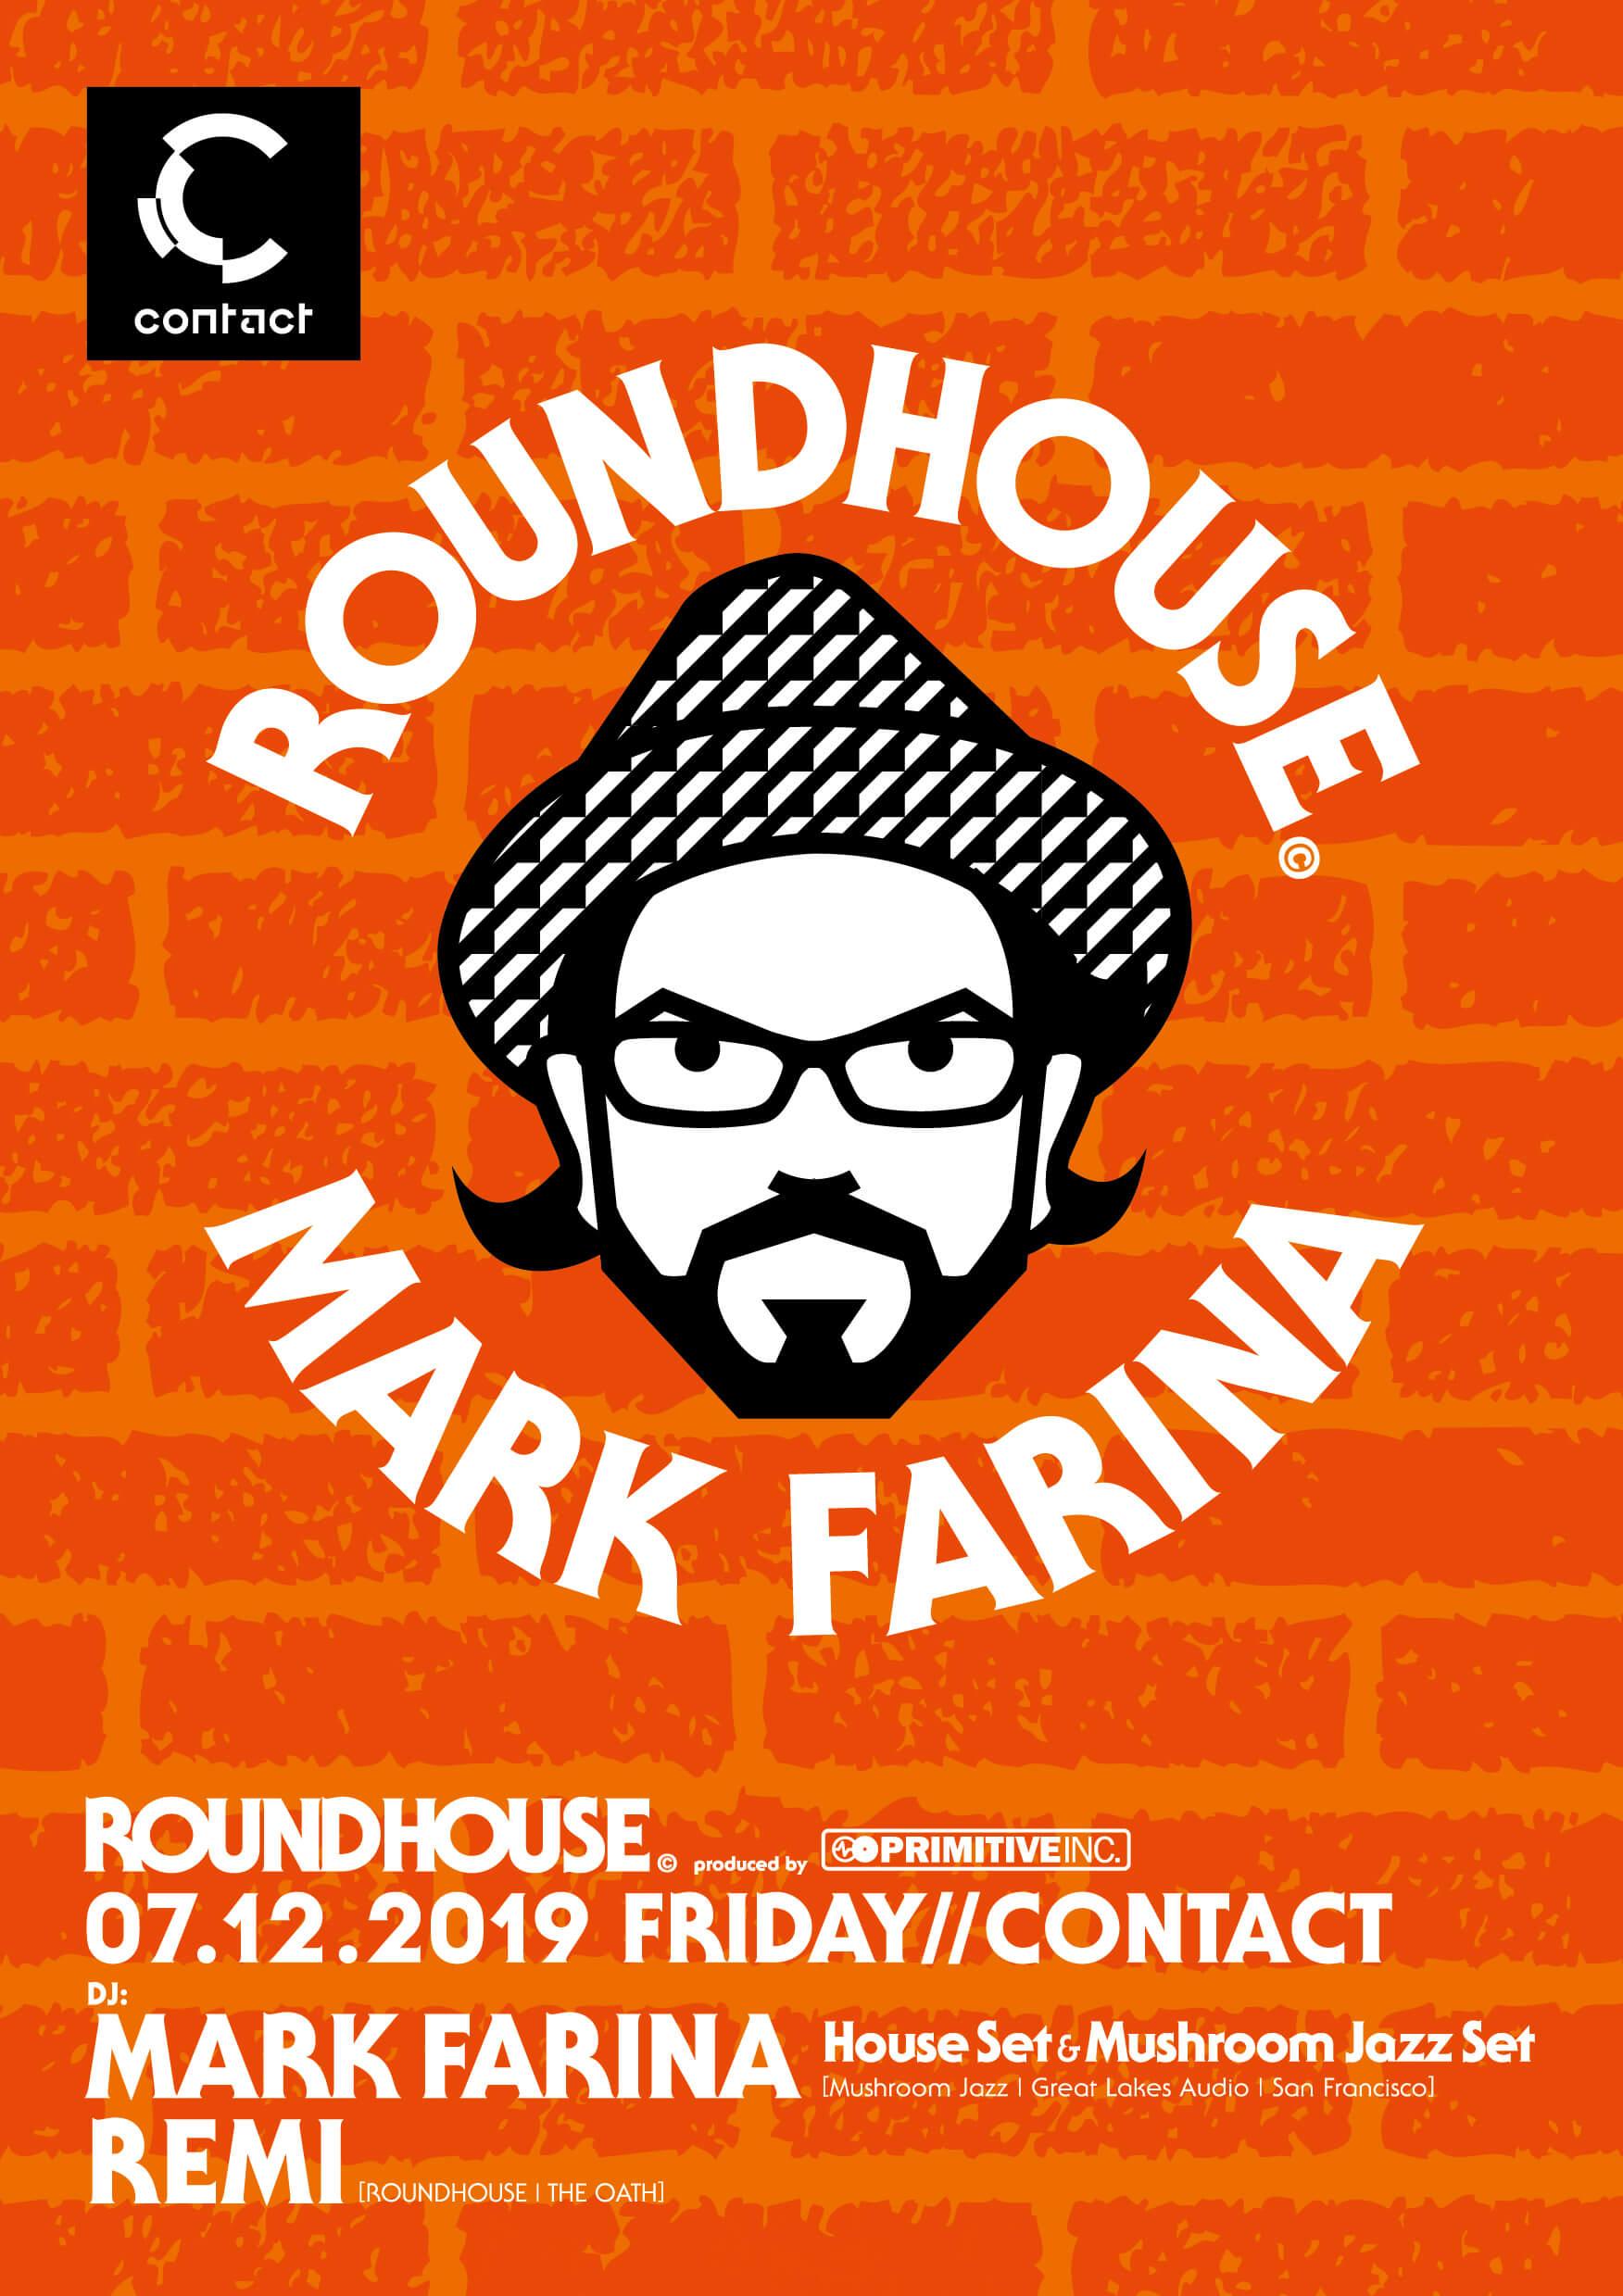 ROUNDHOUSE Mark Farina